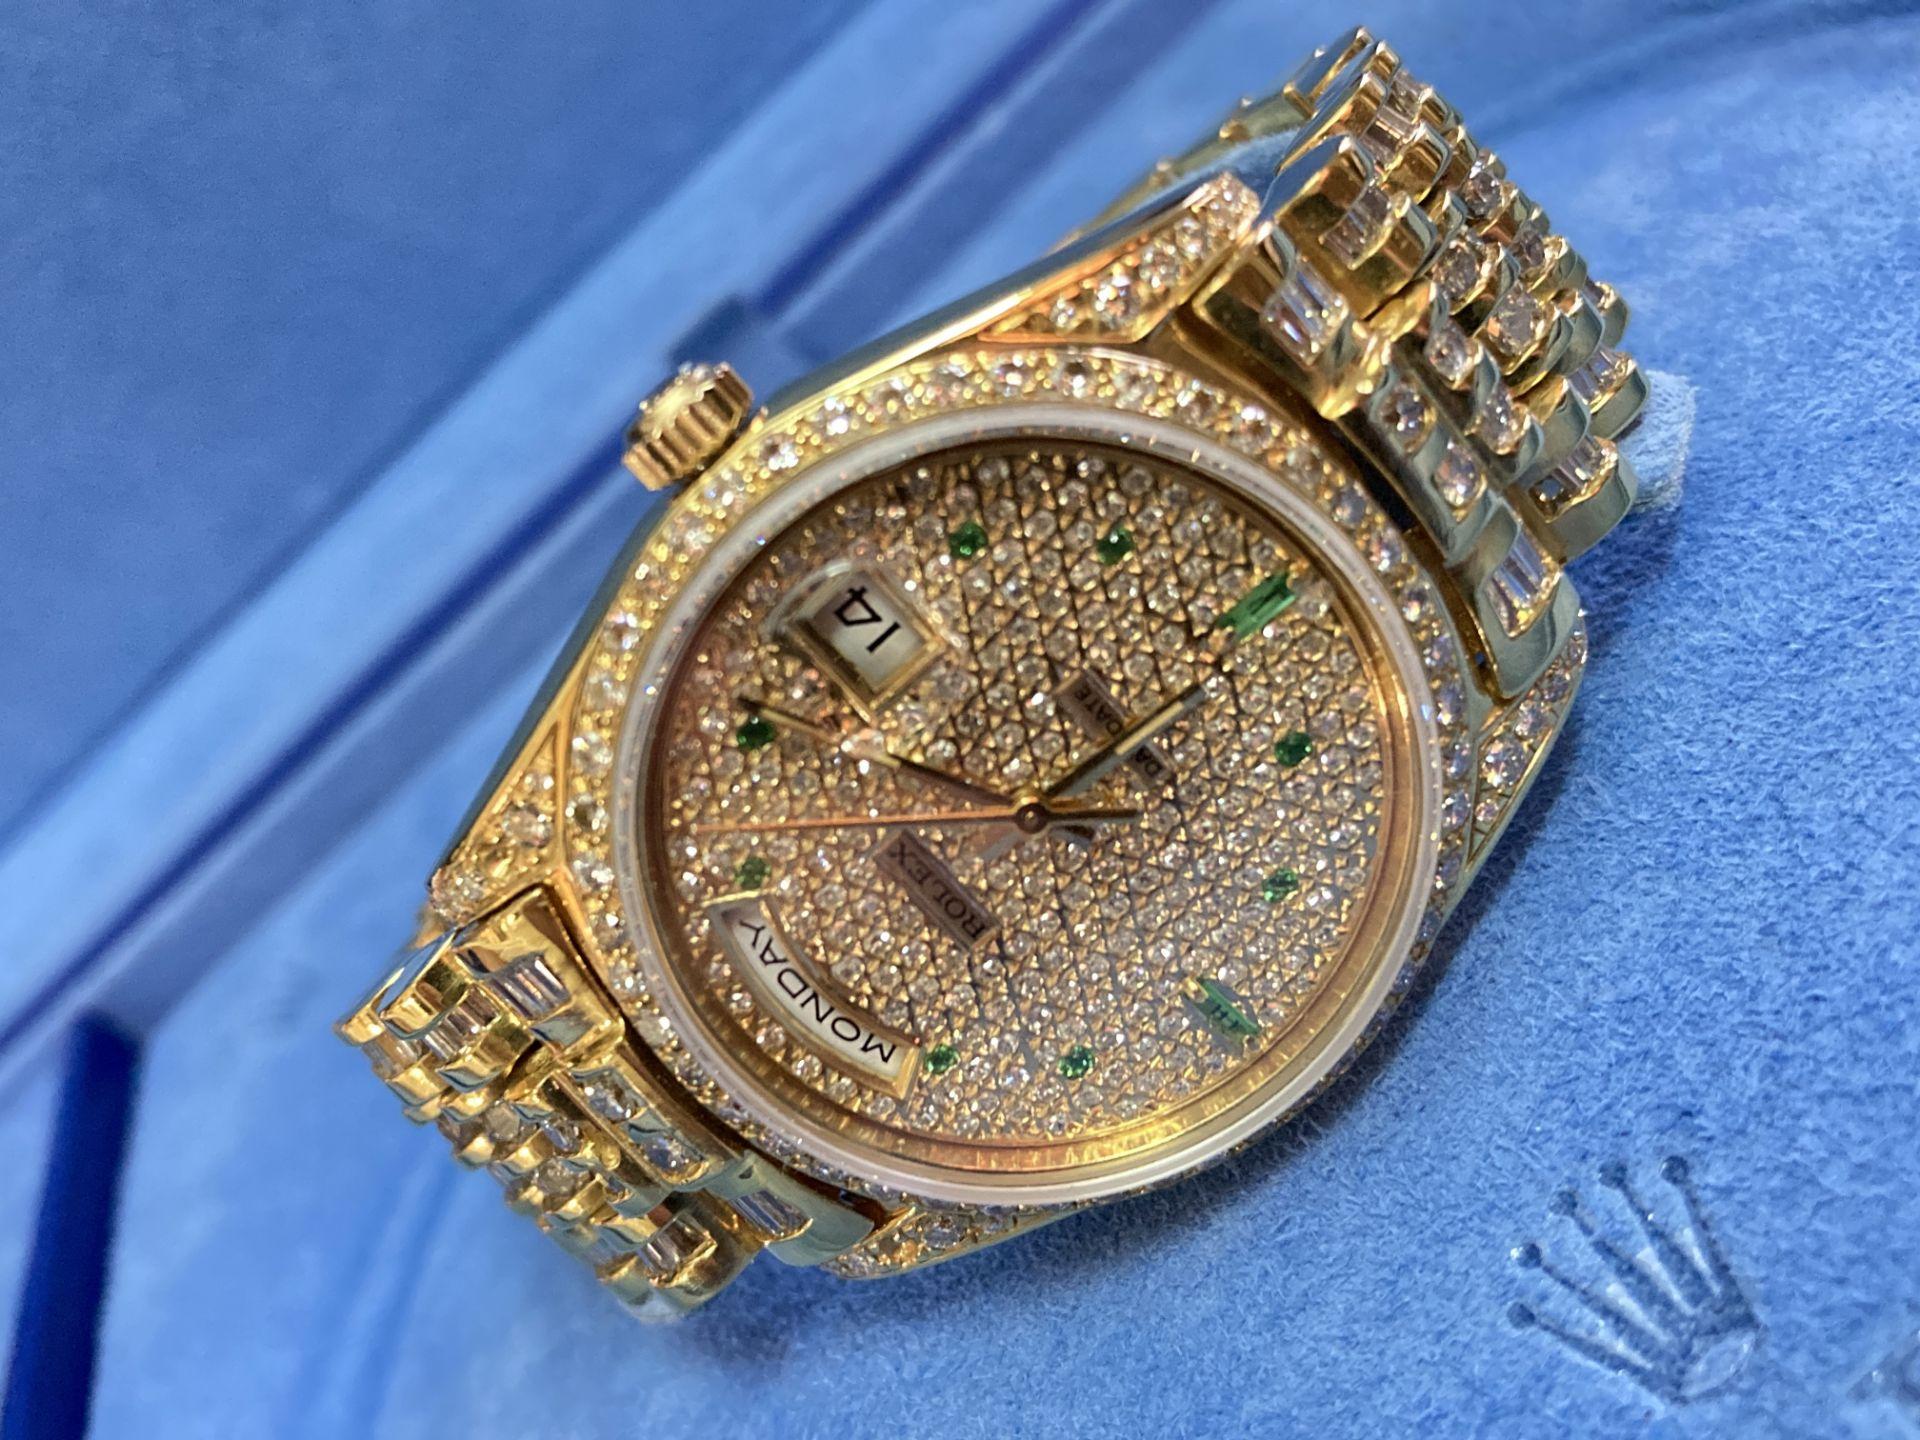 GENTS 36mm ROLEX DAYDATE YELLOW GOLD DIAMOND WATCH - Image 4 of 21